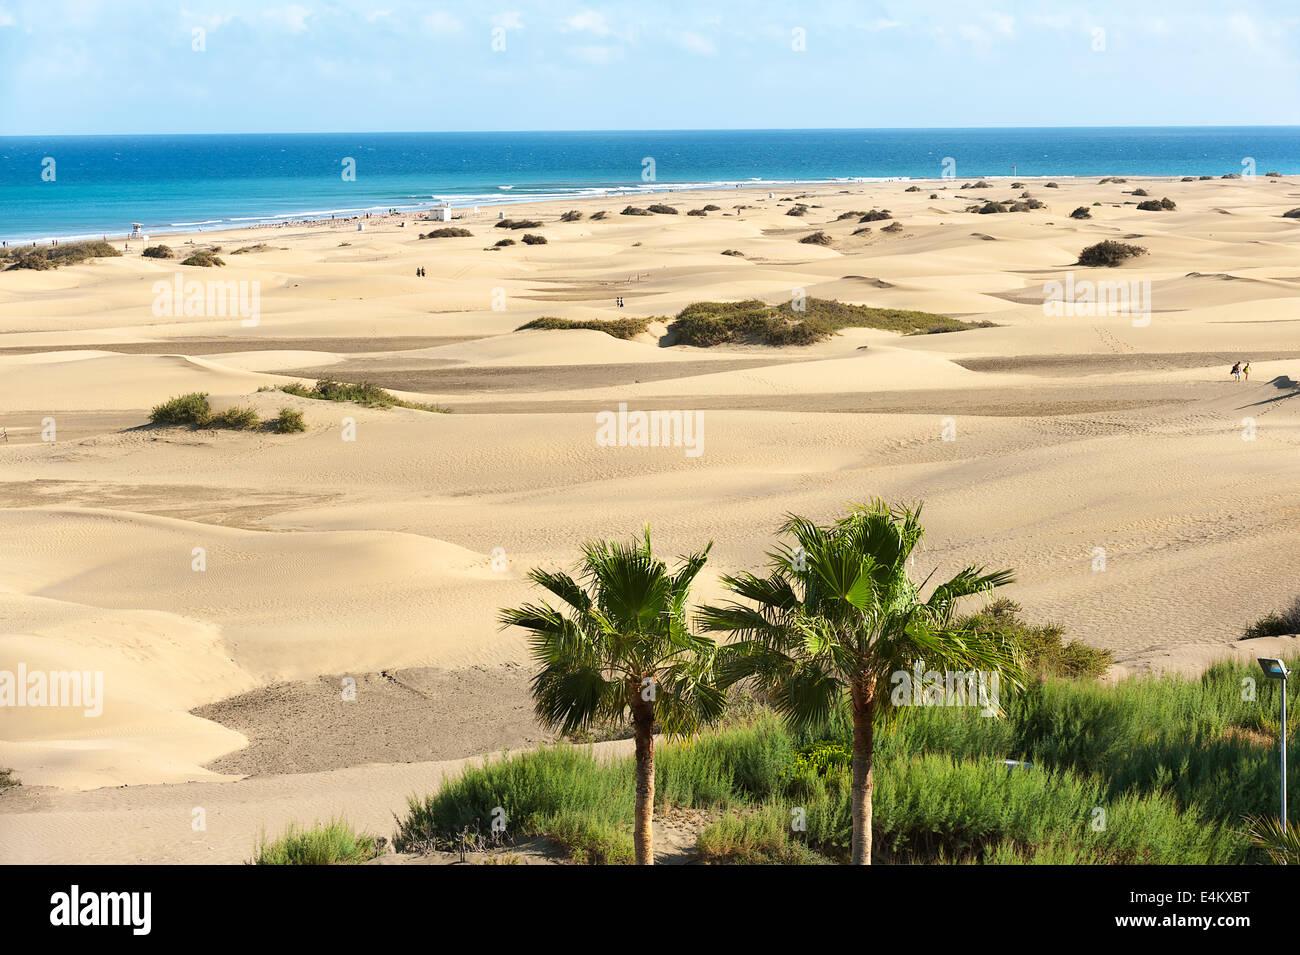 Sandy dunes - Stock Image